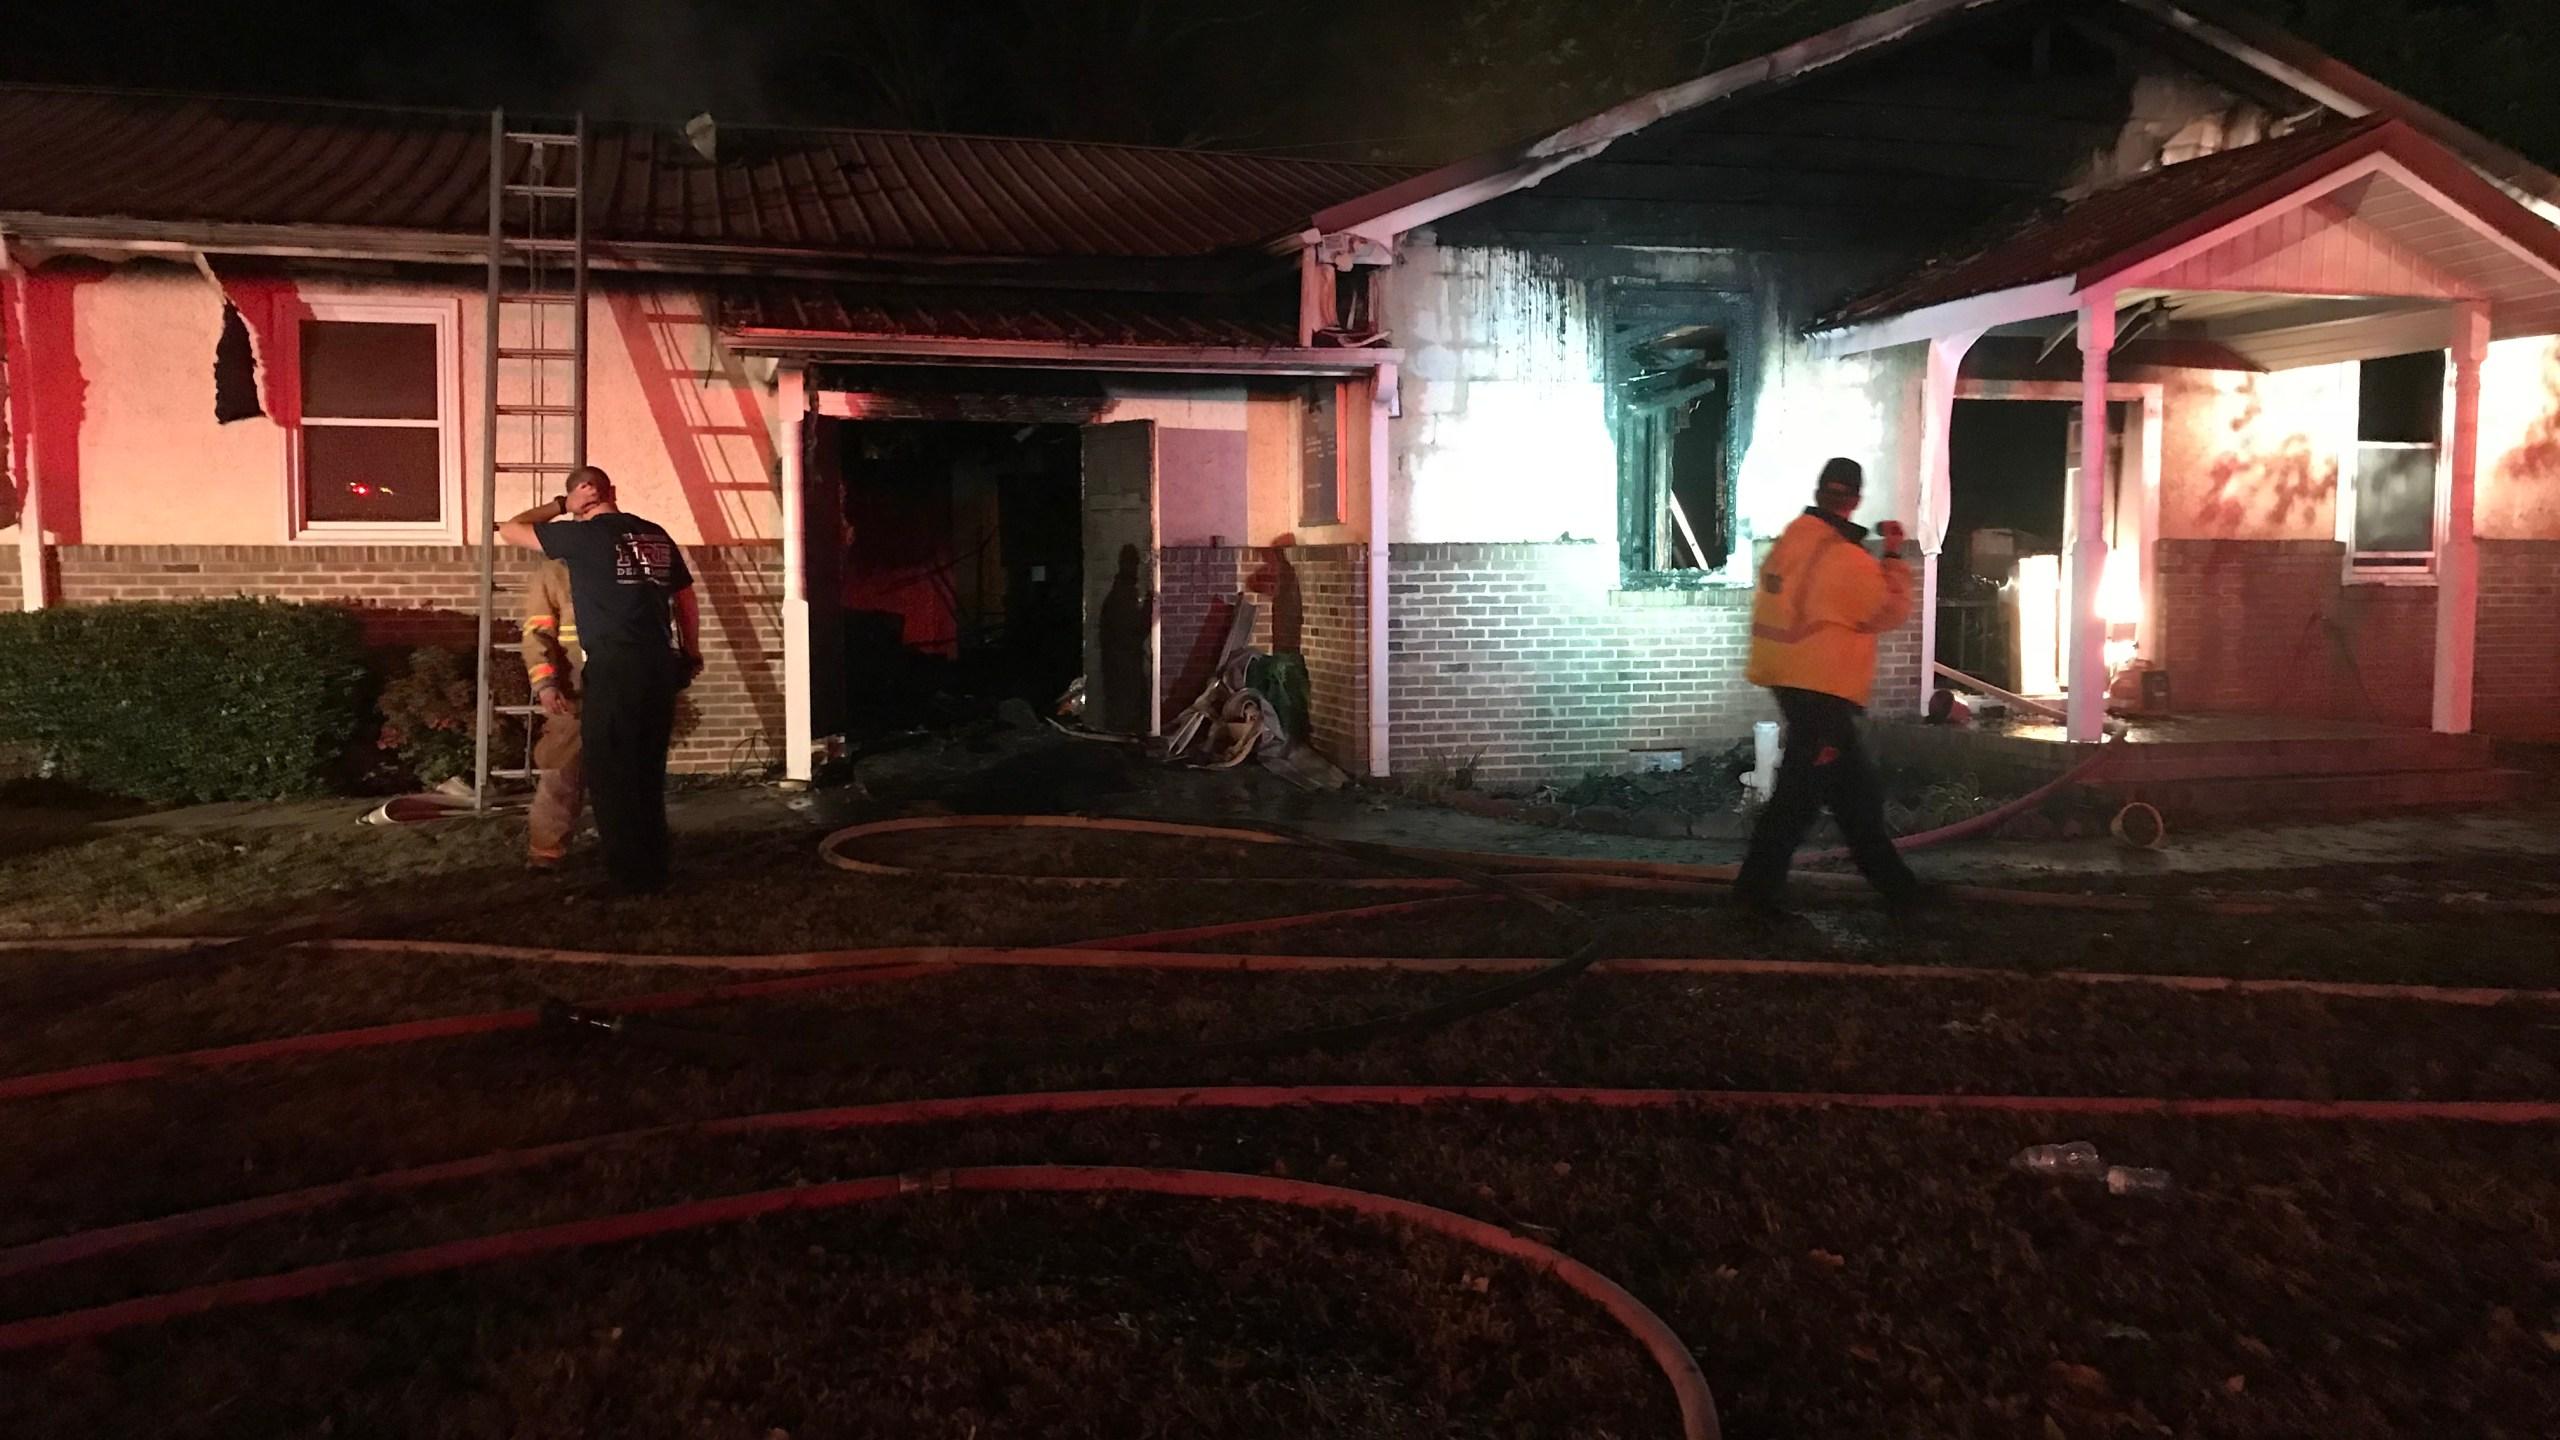 Power 4 Living Church fire Greenville County_499070